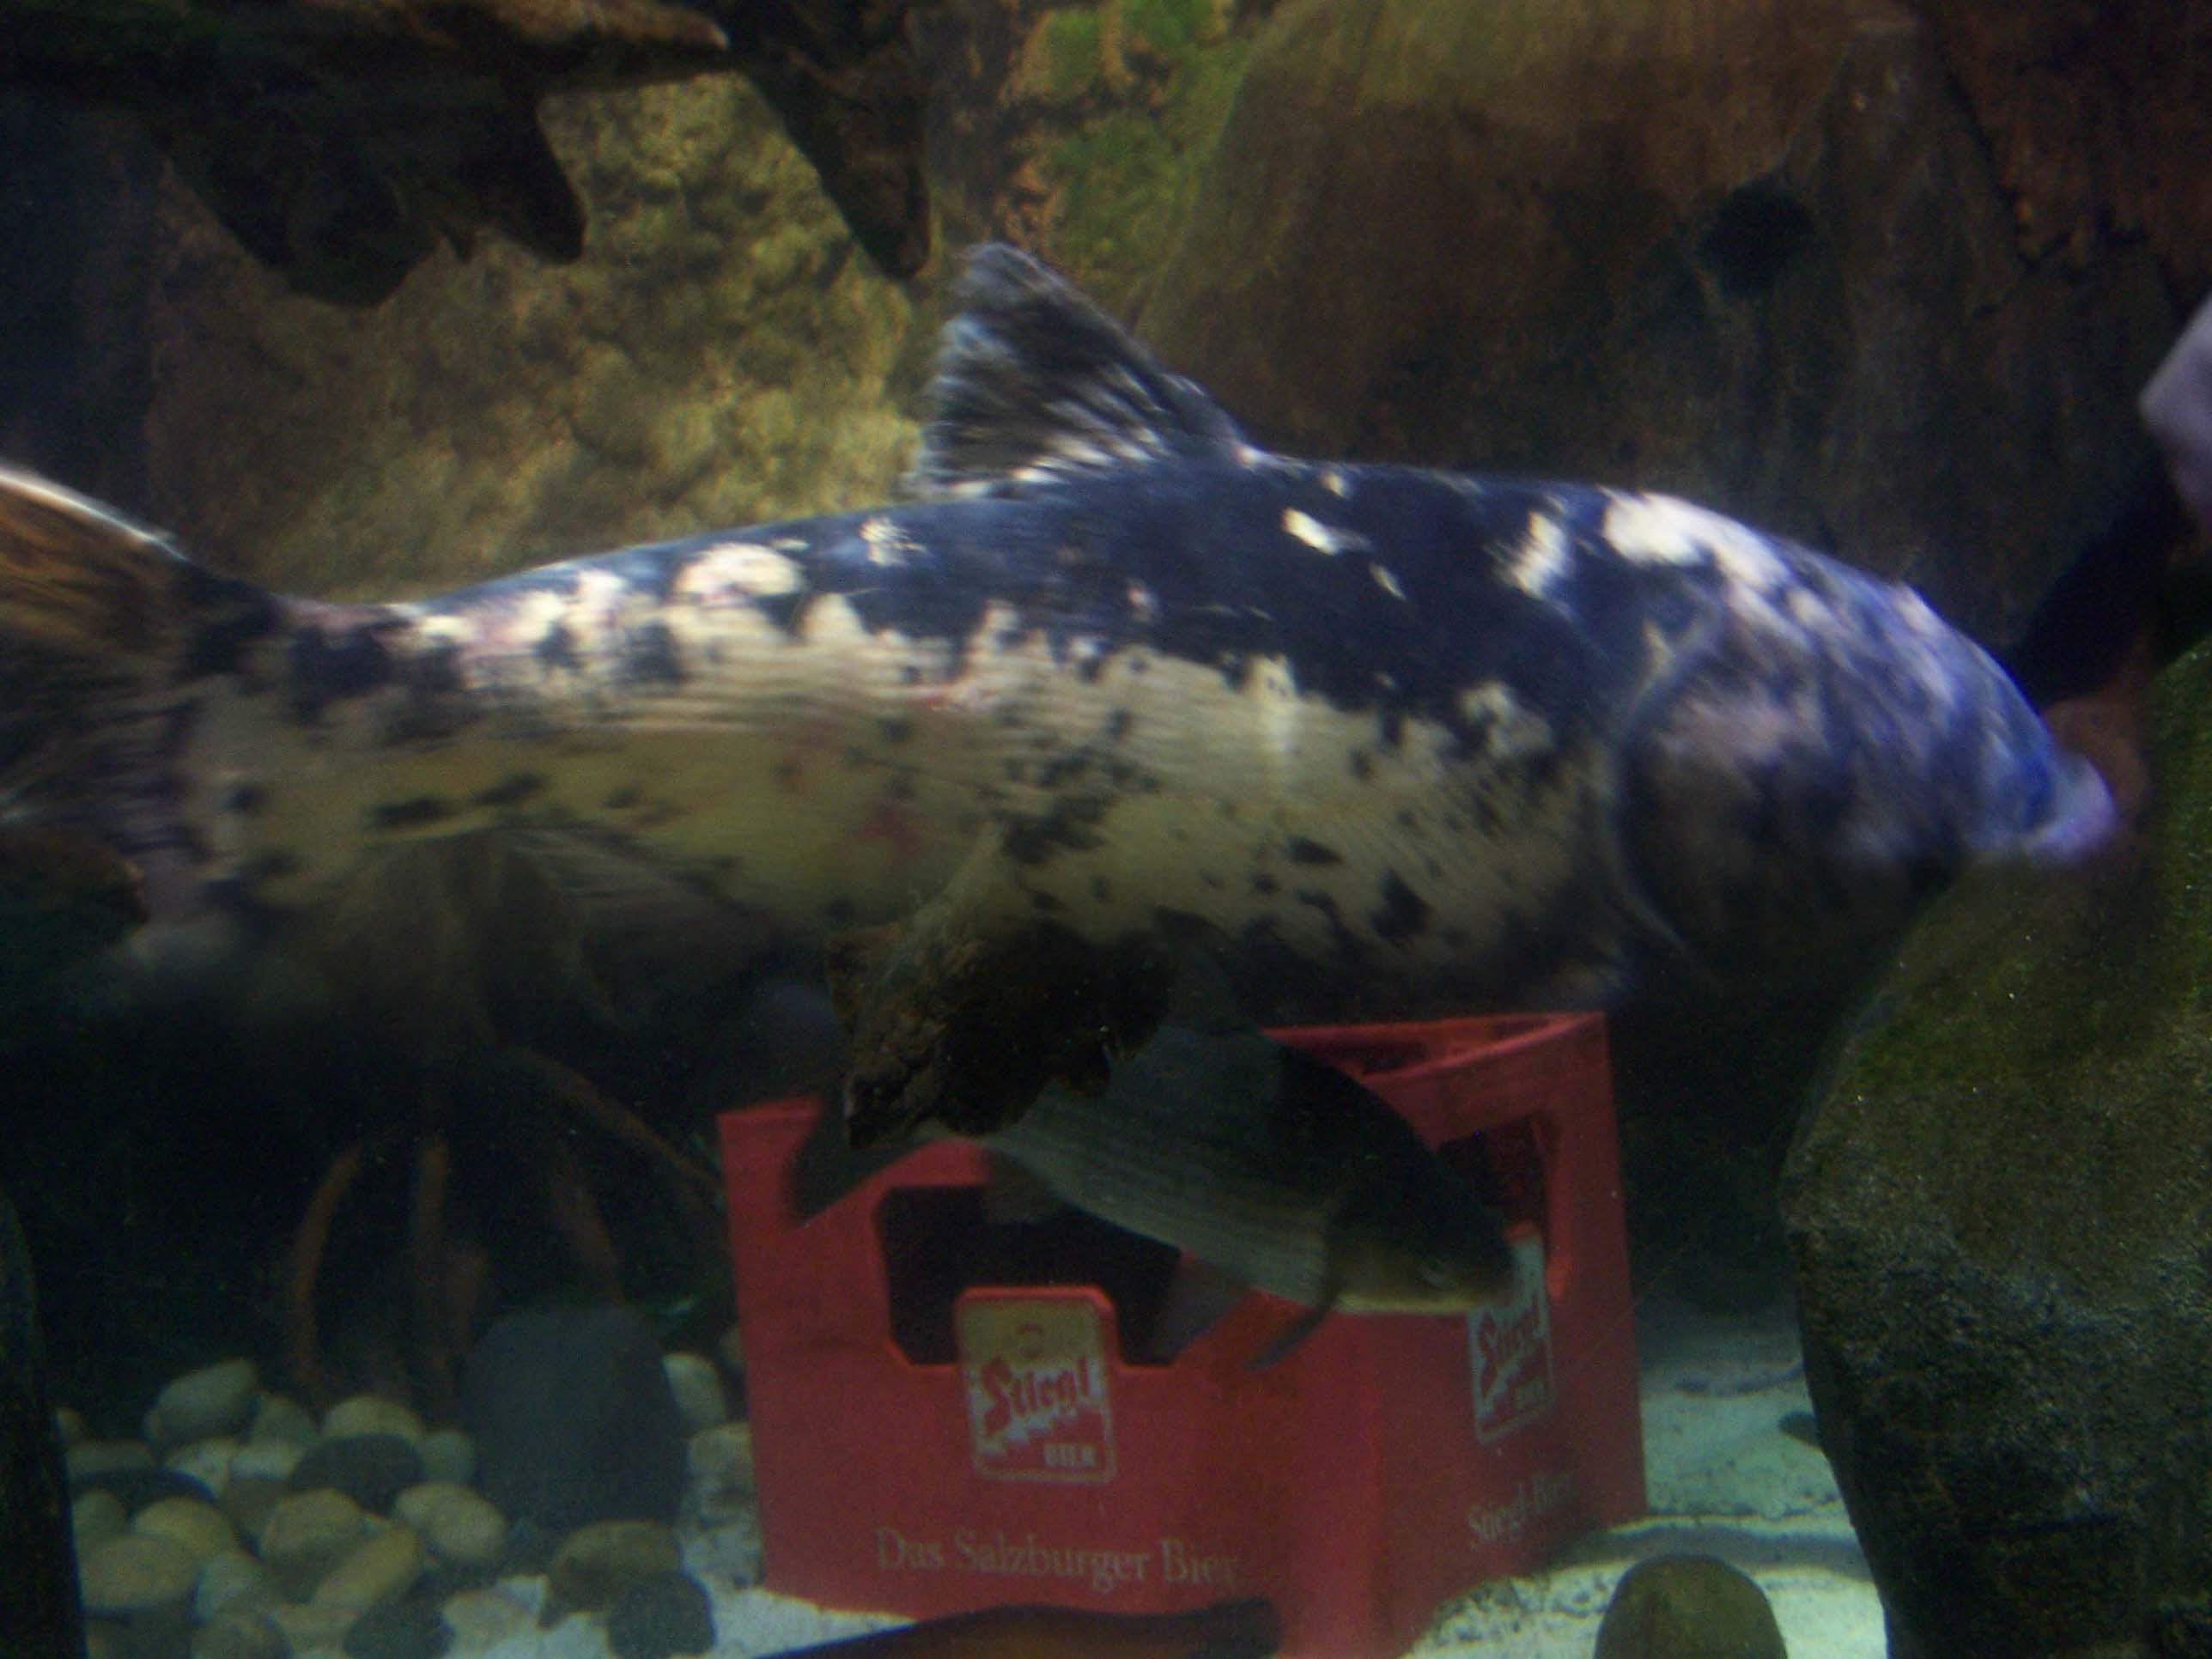 Marmorkarpfen Moby Dick, Stiegl Bräu Salzburg